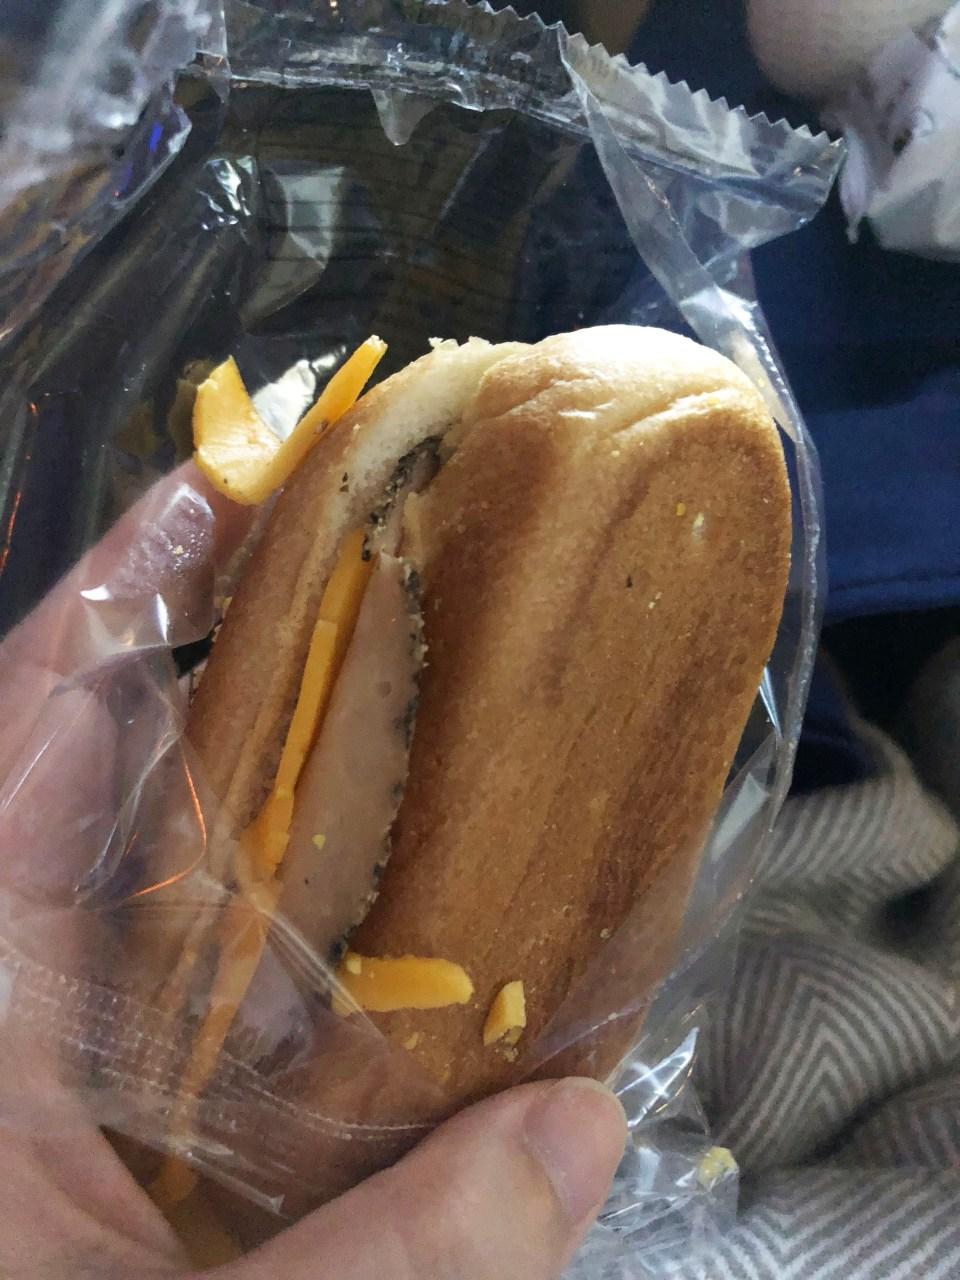 Plane food - ham & cheese sandwich